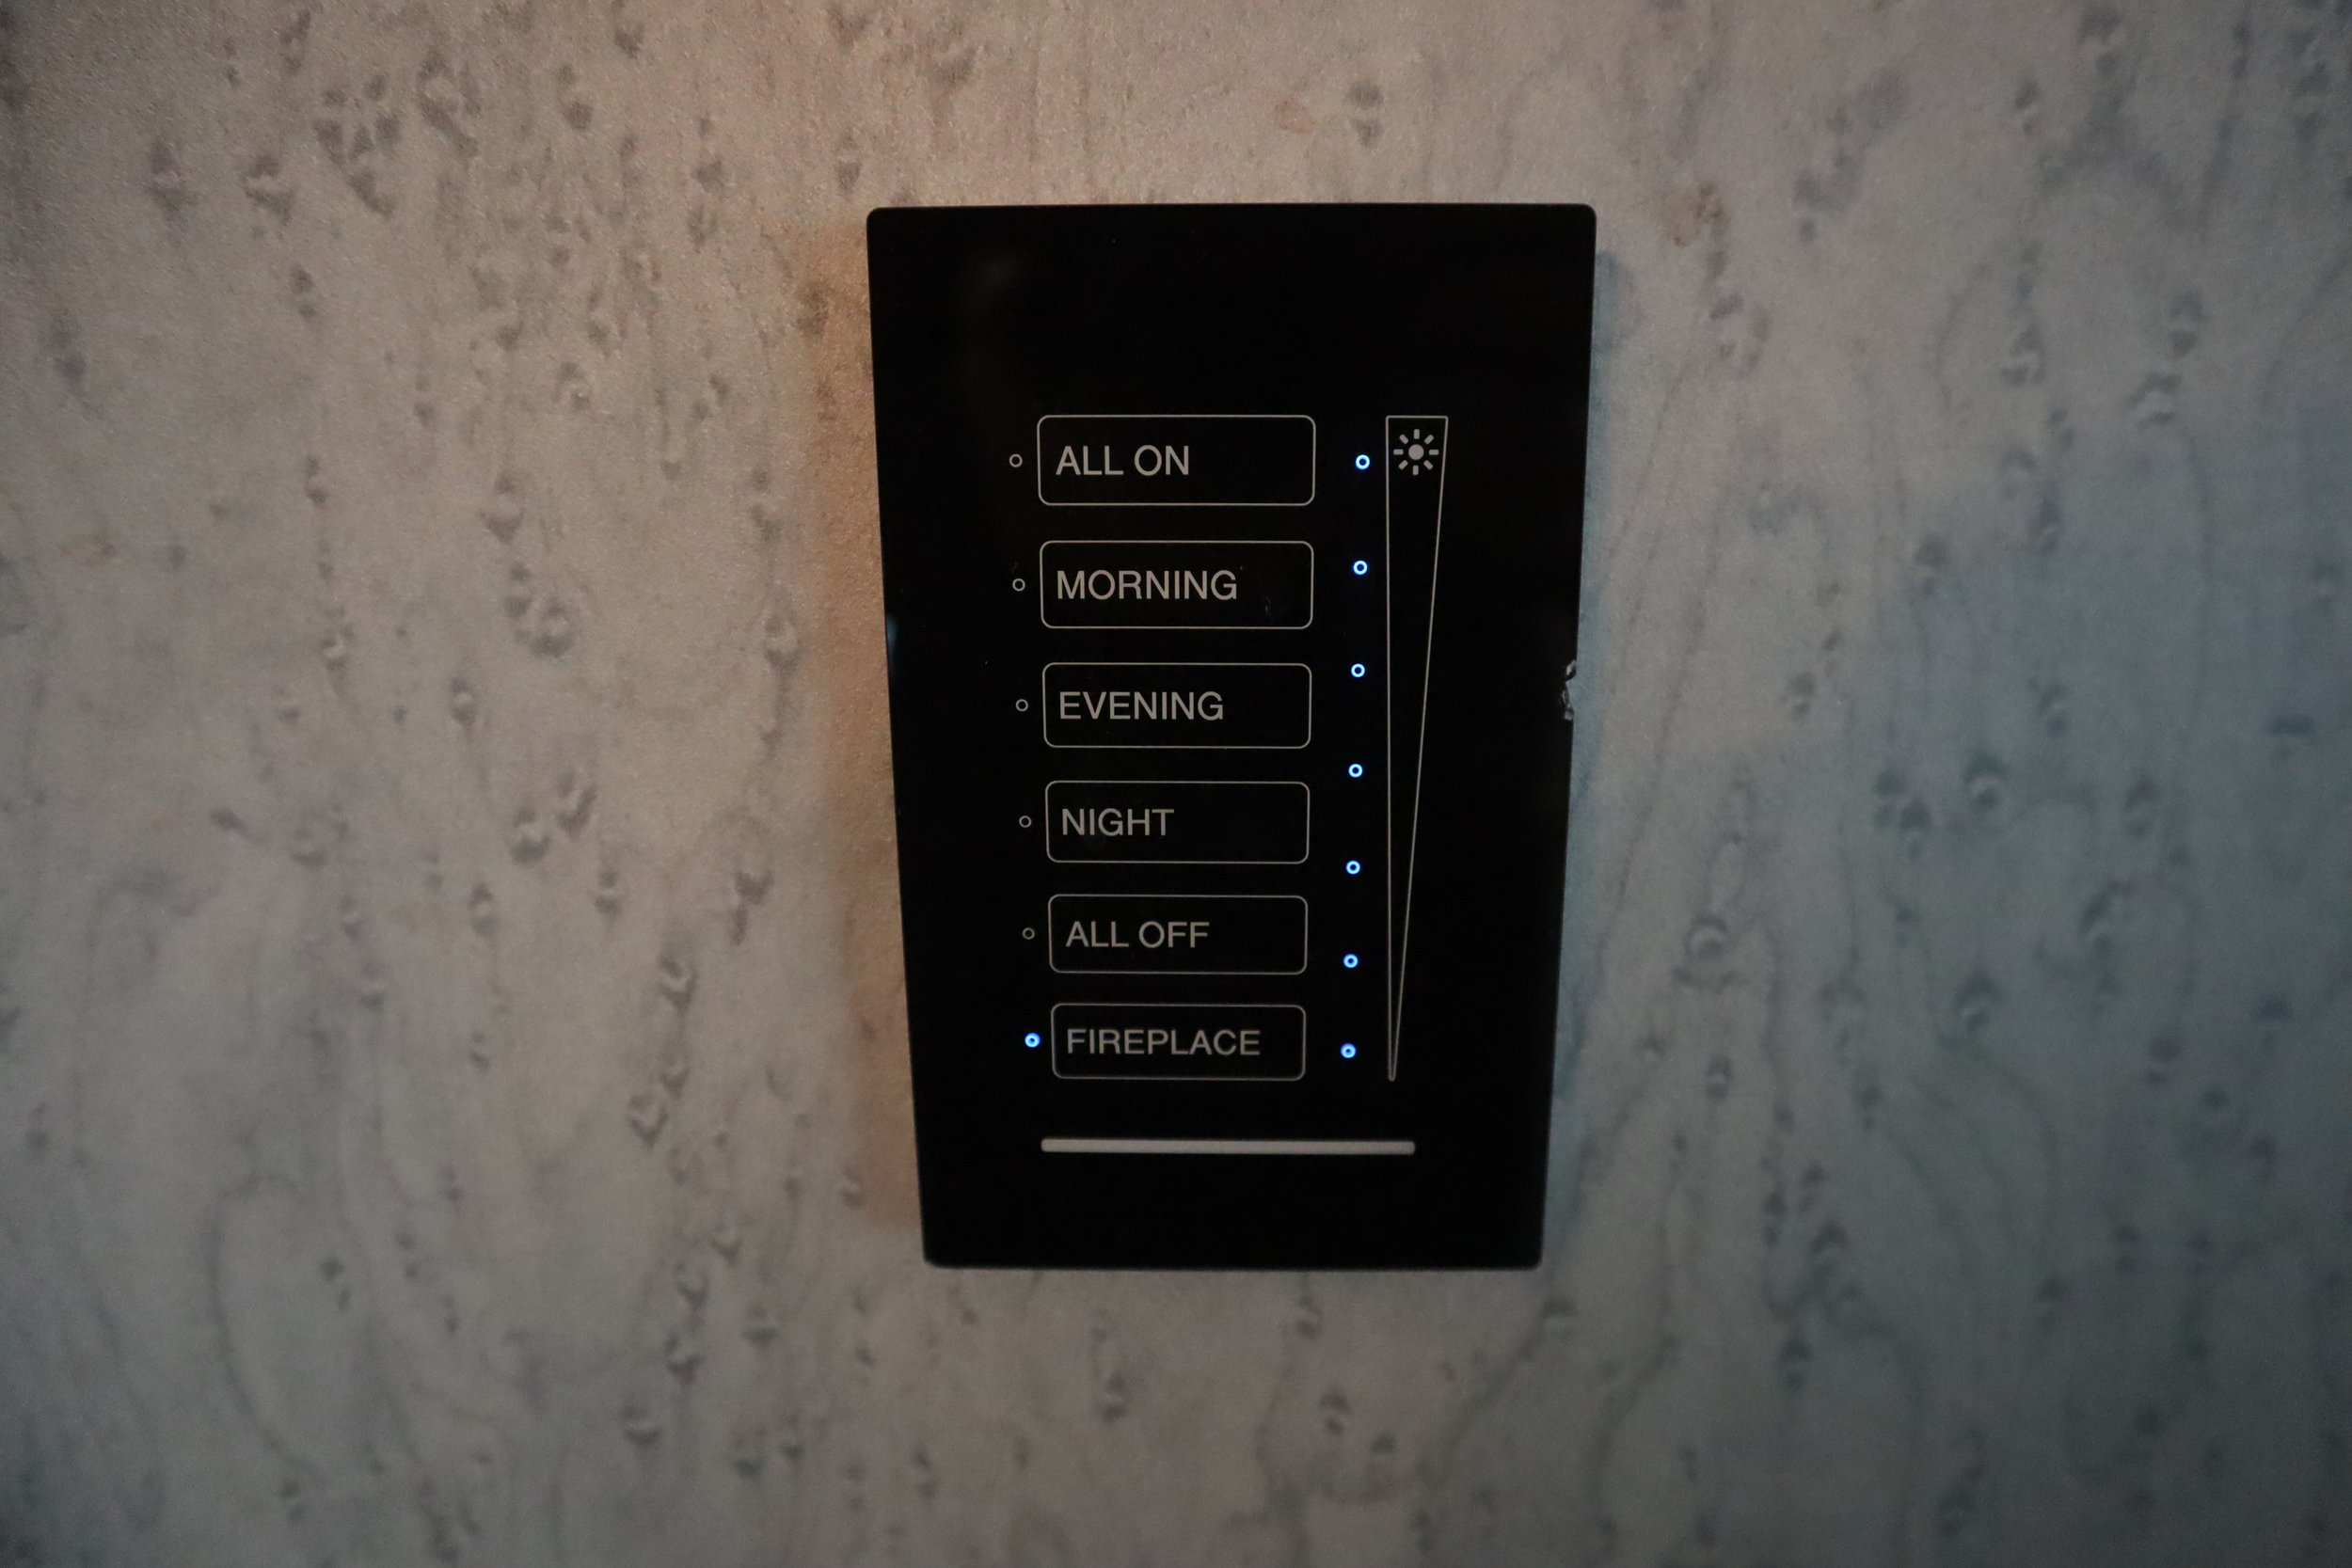 St. Regis Toronto – Control panels